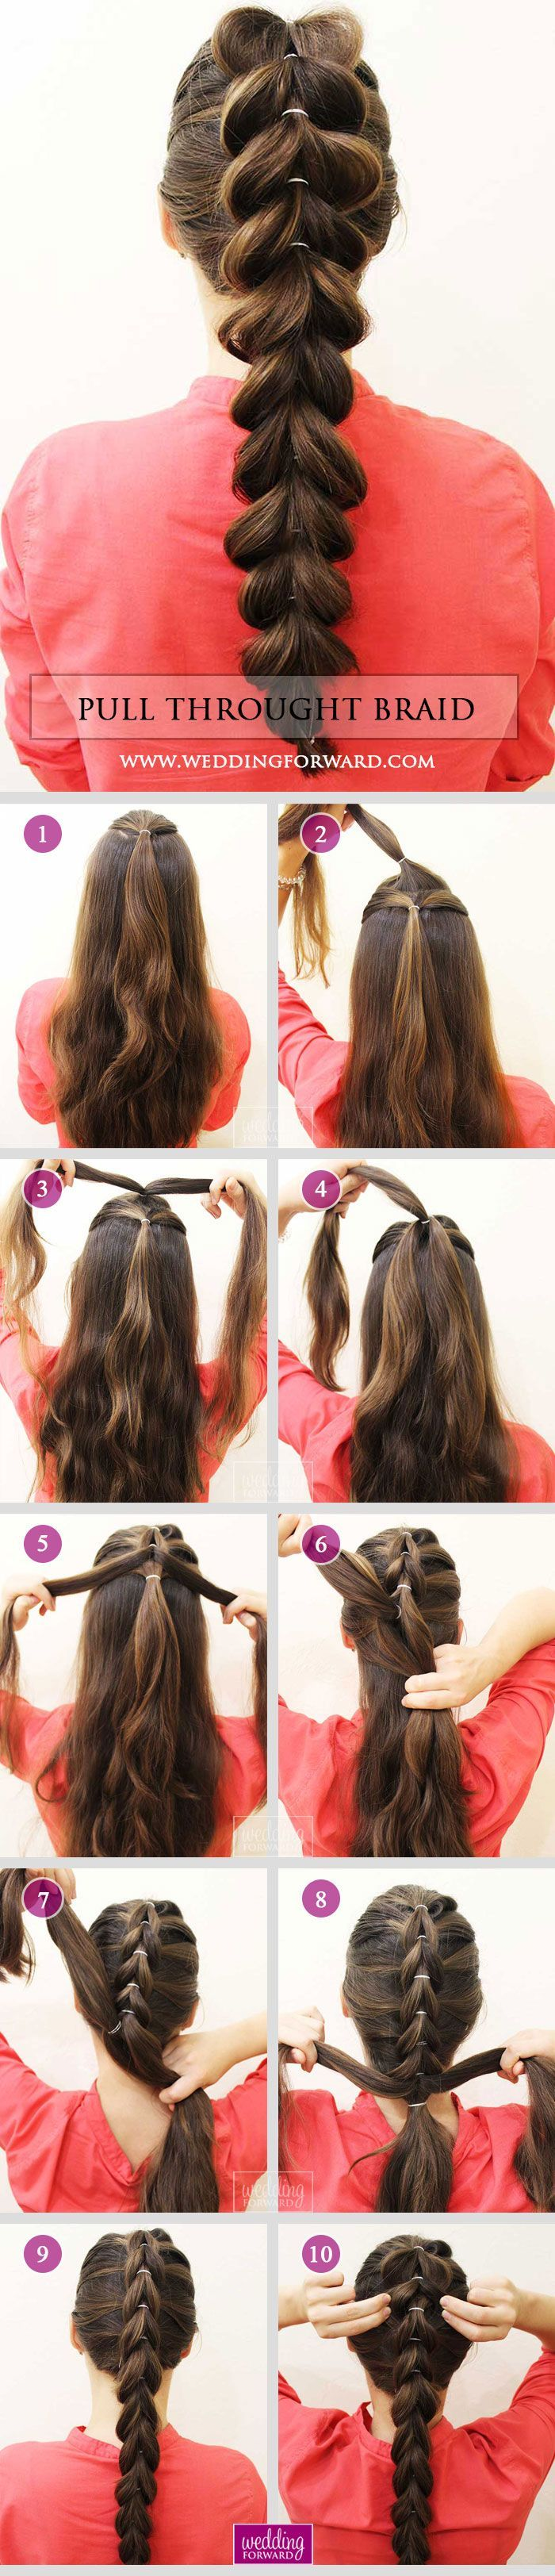 113 best Hair DIY images on Pinterest